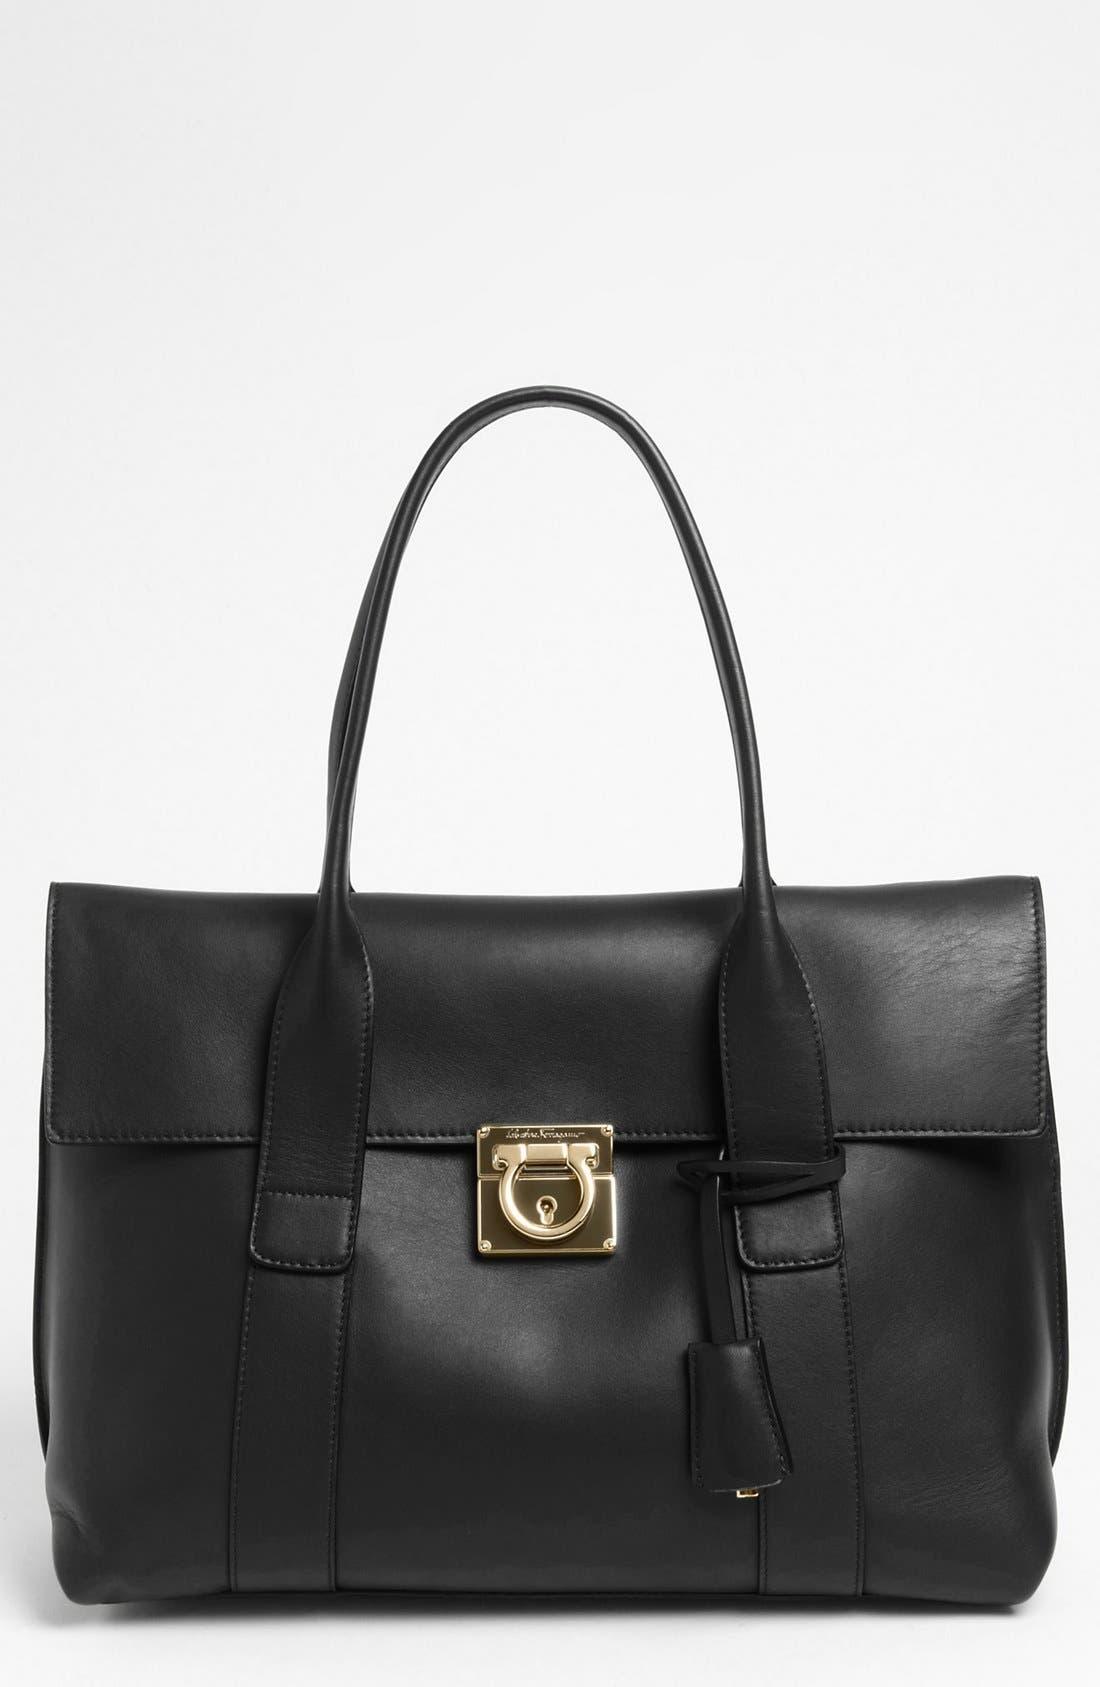 Main Image - Salvatore Ferragamo 'Sookie' Leather Shopper